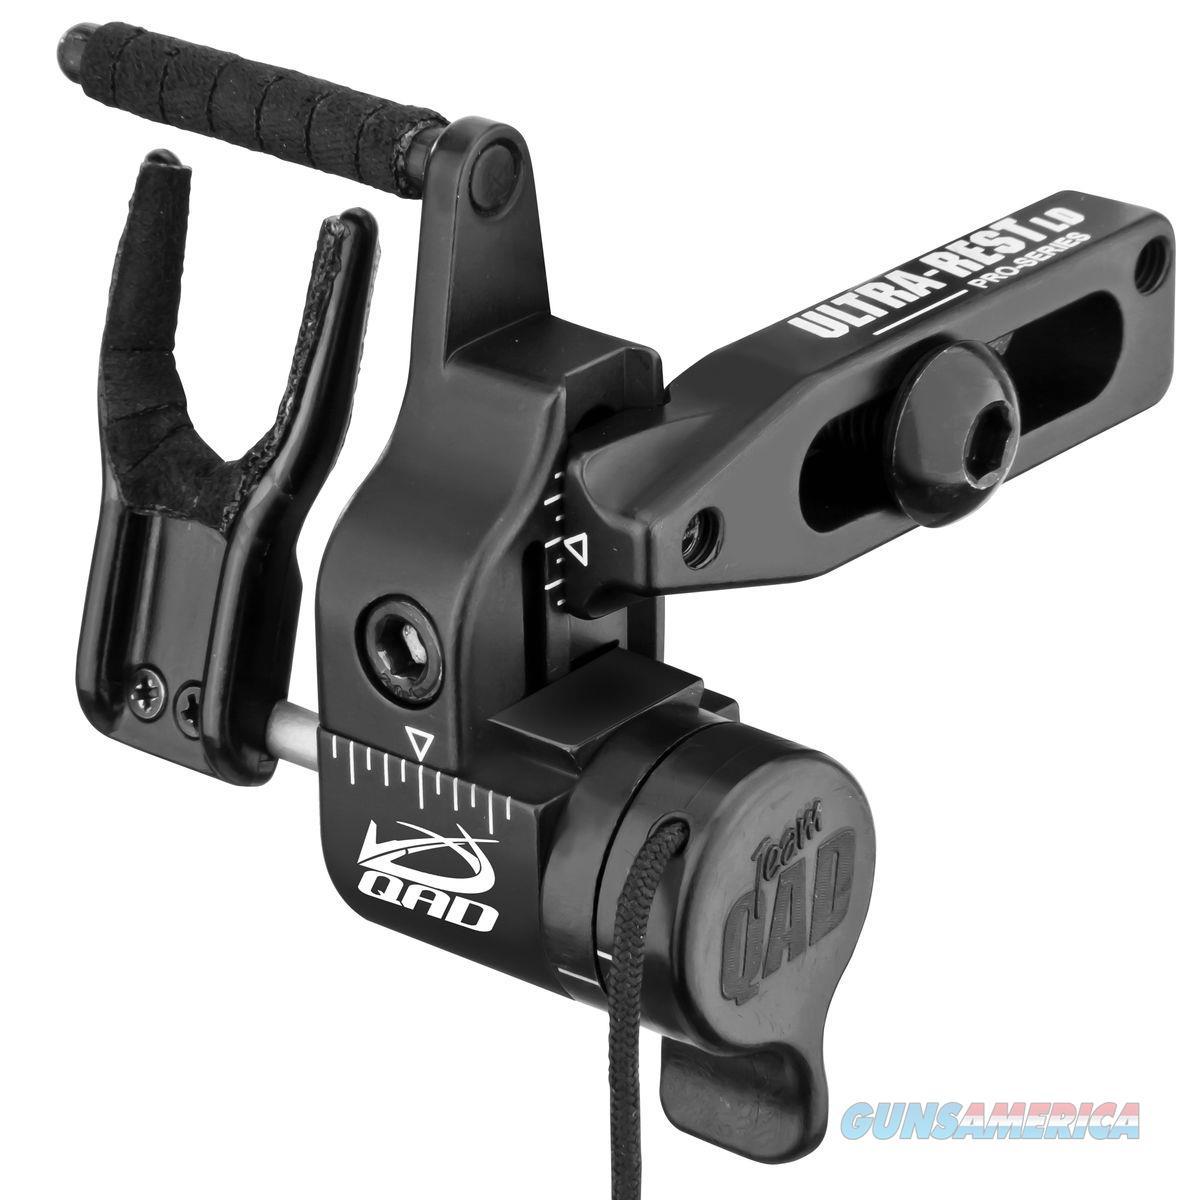 Qad Ultra Rest Pro Series Ld Black With Lock Down Technology QURL  Non-Guns > Gun Parts > Misc > Rifles